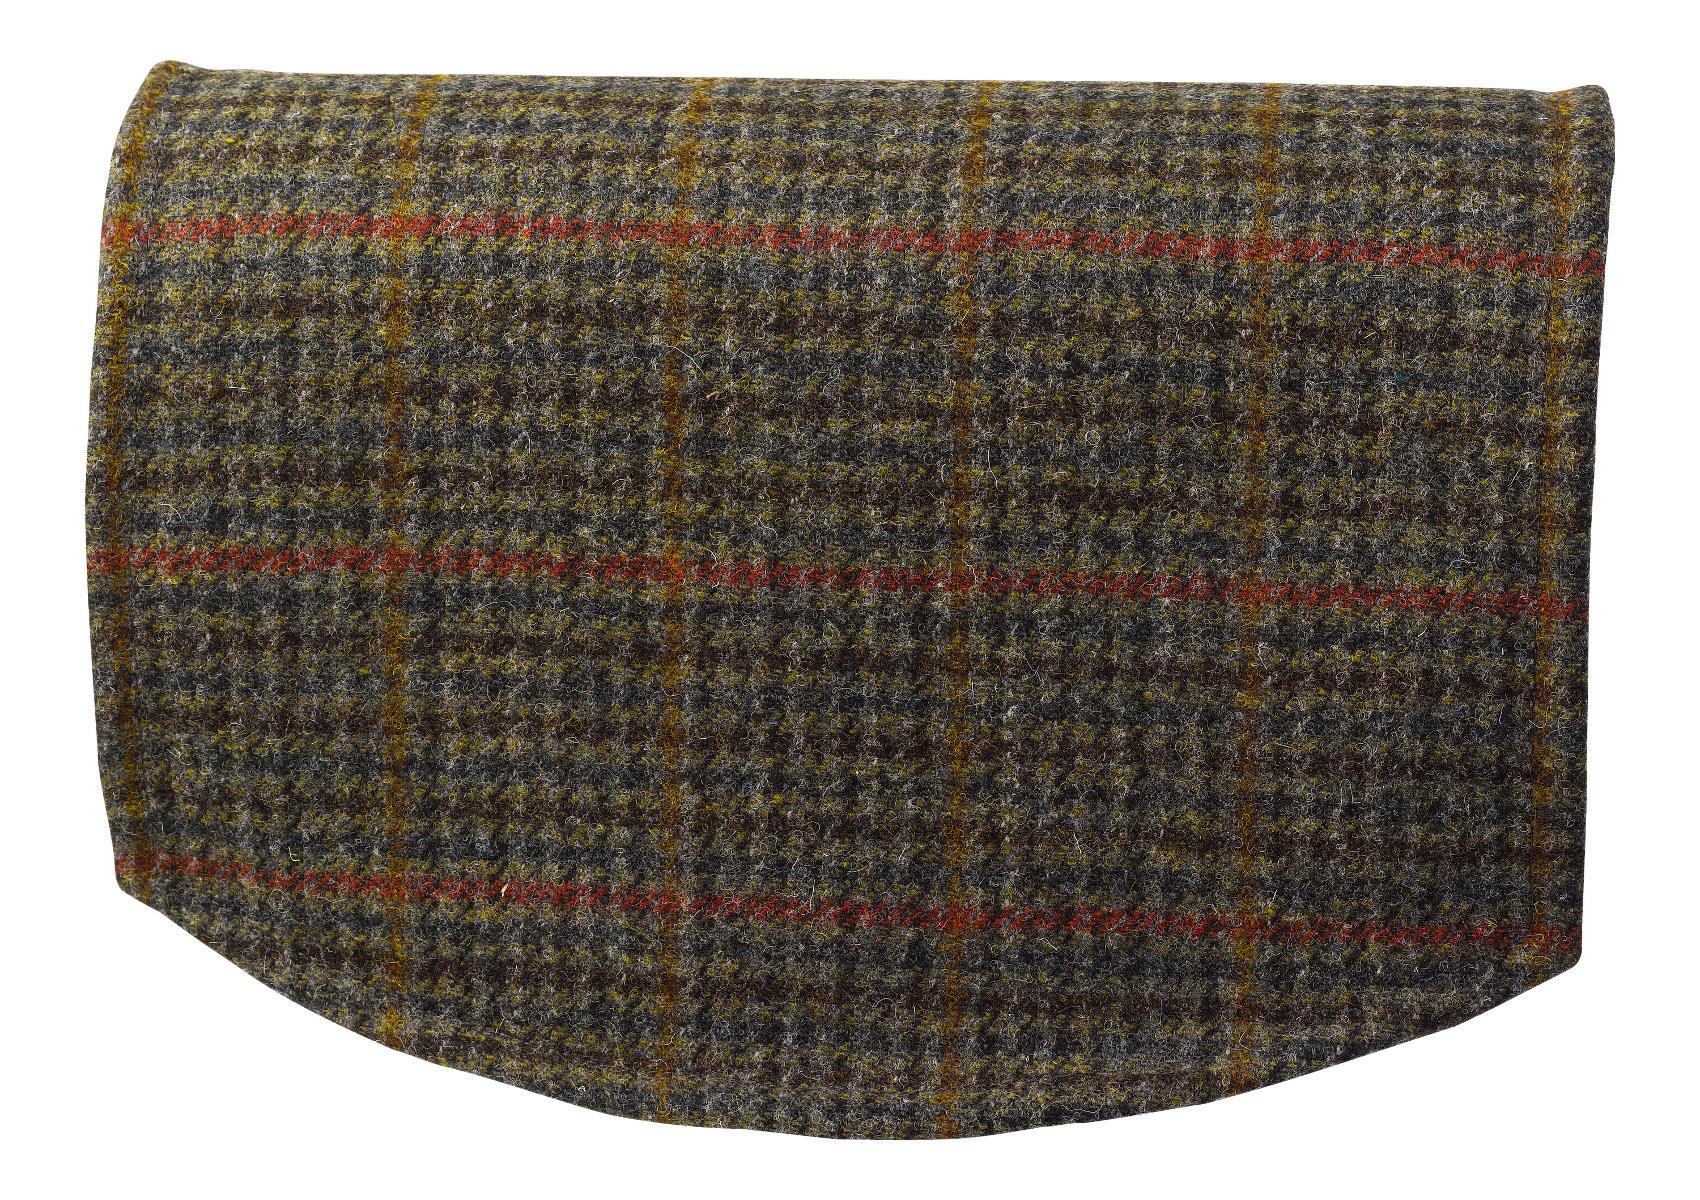 chair covers scotland baseball glove bean bag scottish tweed single back 100 pure new wool sofa